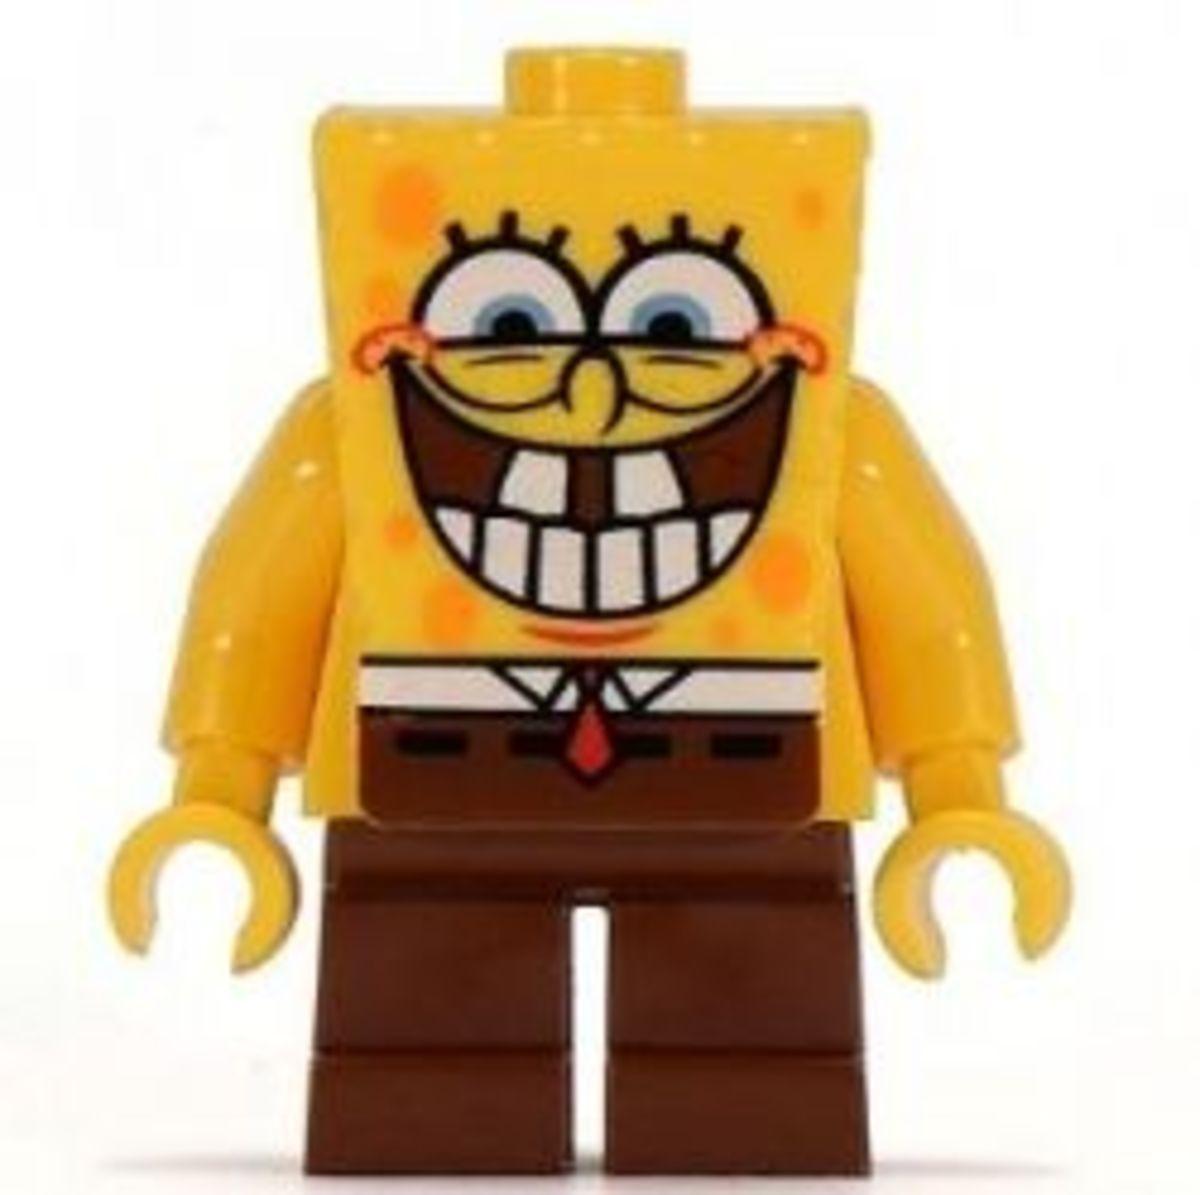 Spongebob Squarepants Cartoon Network Lego